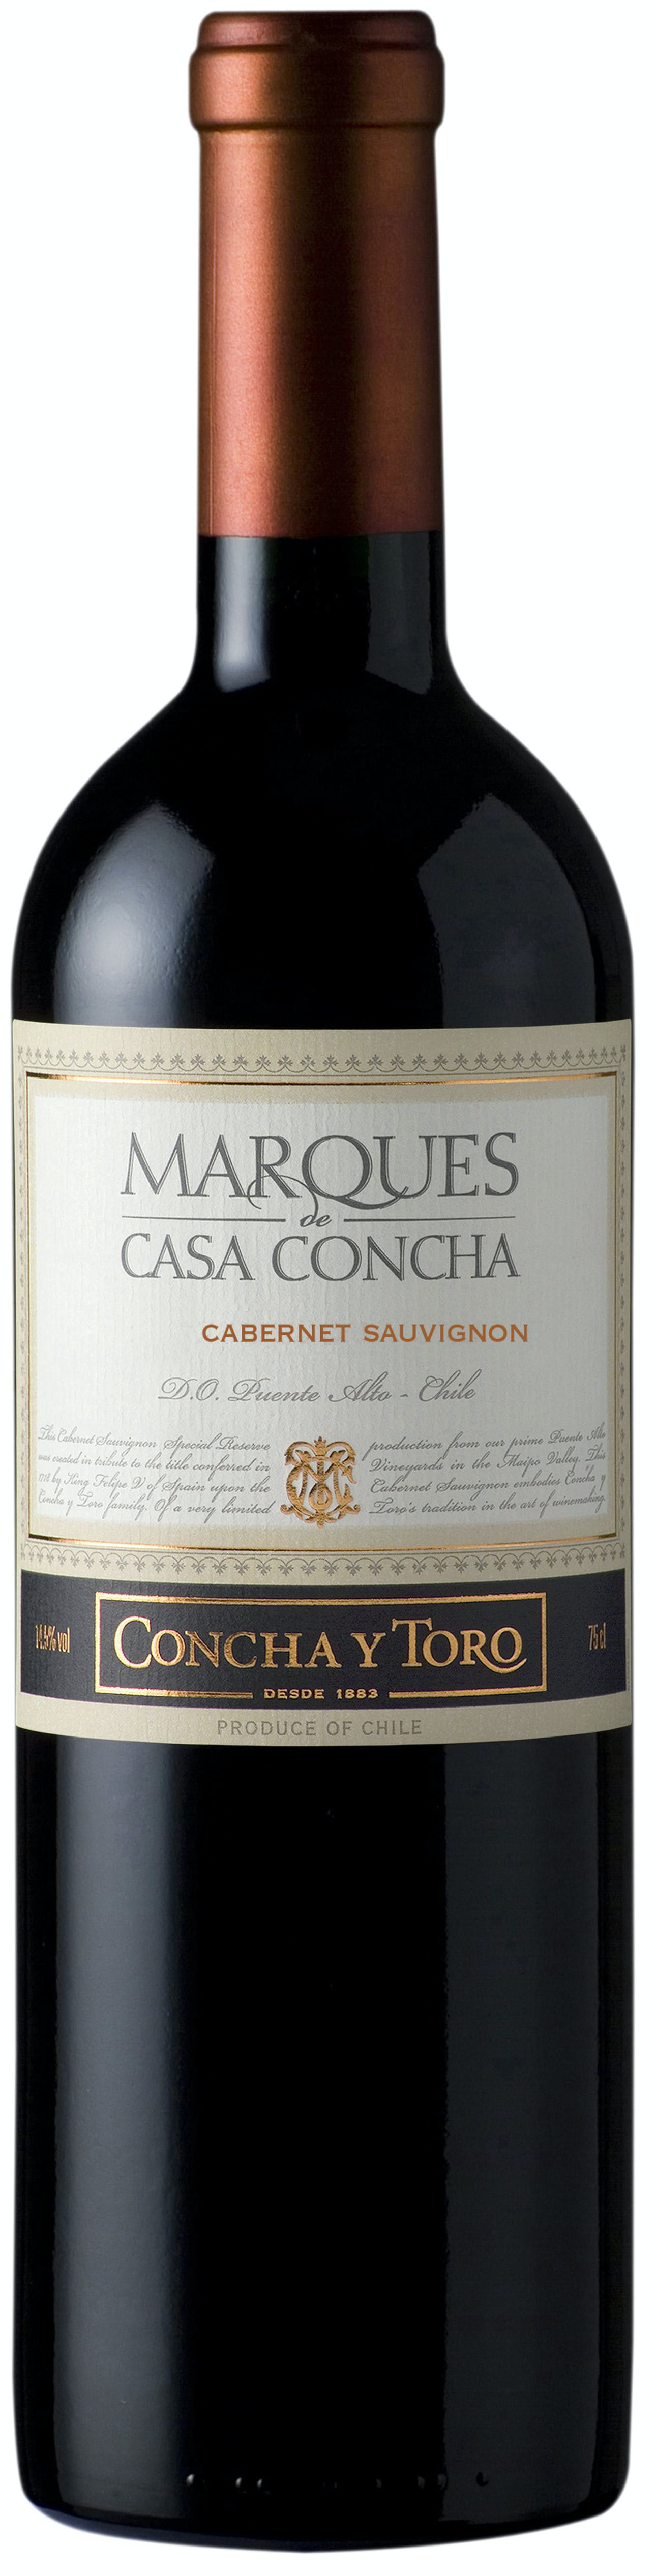 Concha Y Toro Marques De Casa Cabernet Sauvignon 2015